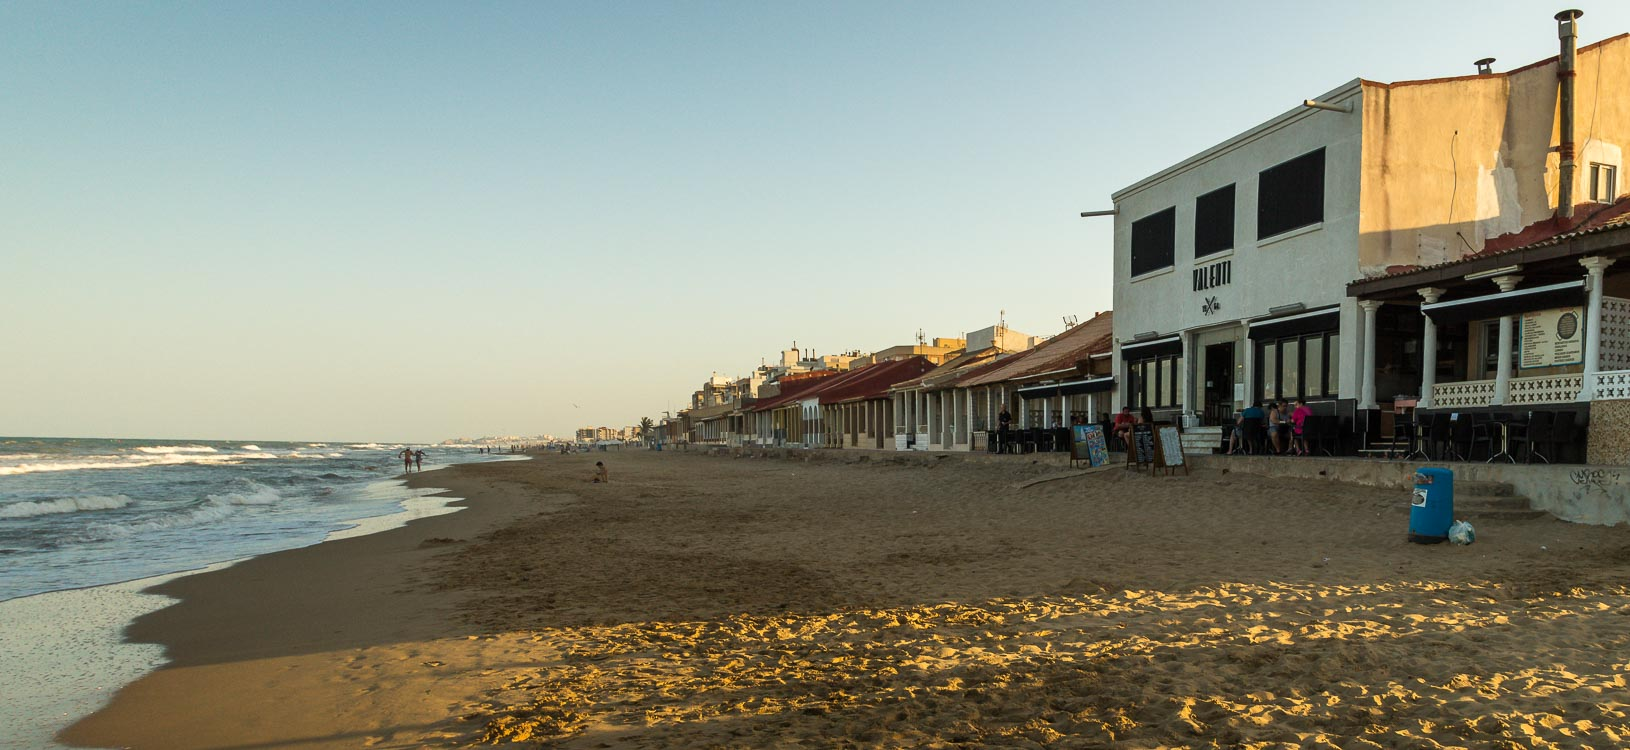 Guardamar del Segura Strandhäuser